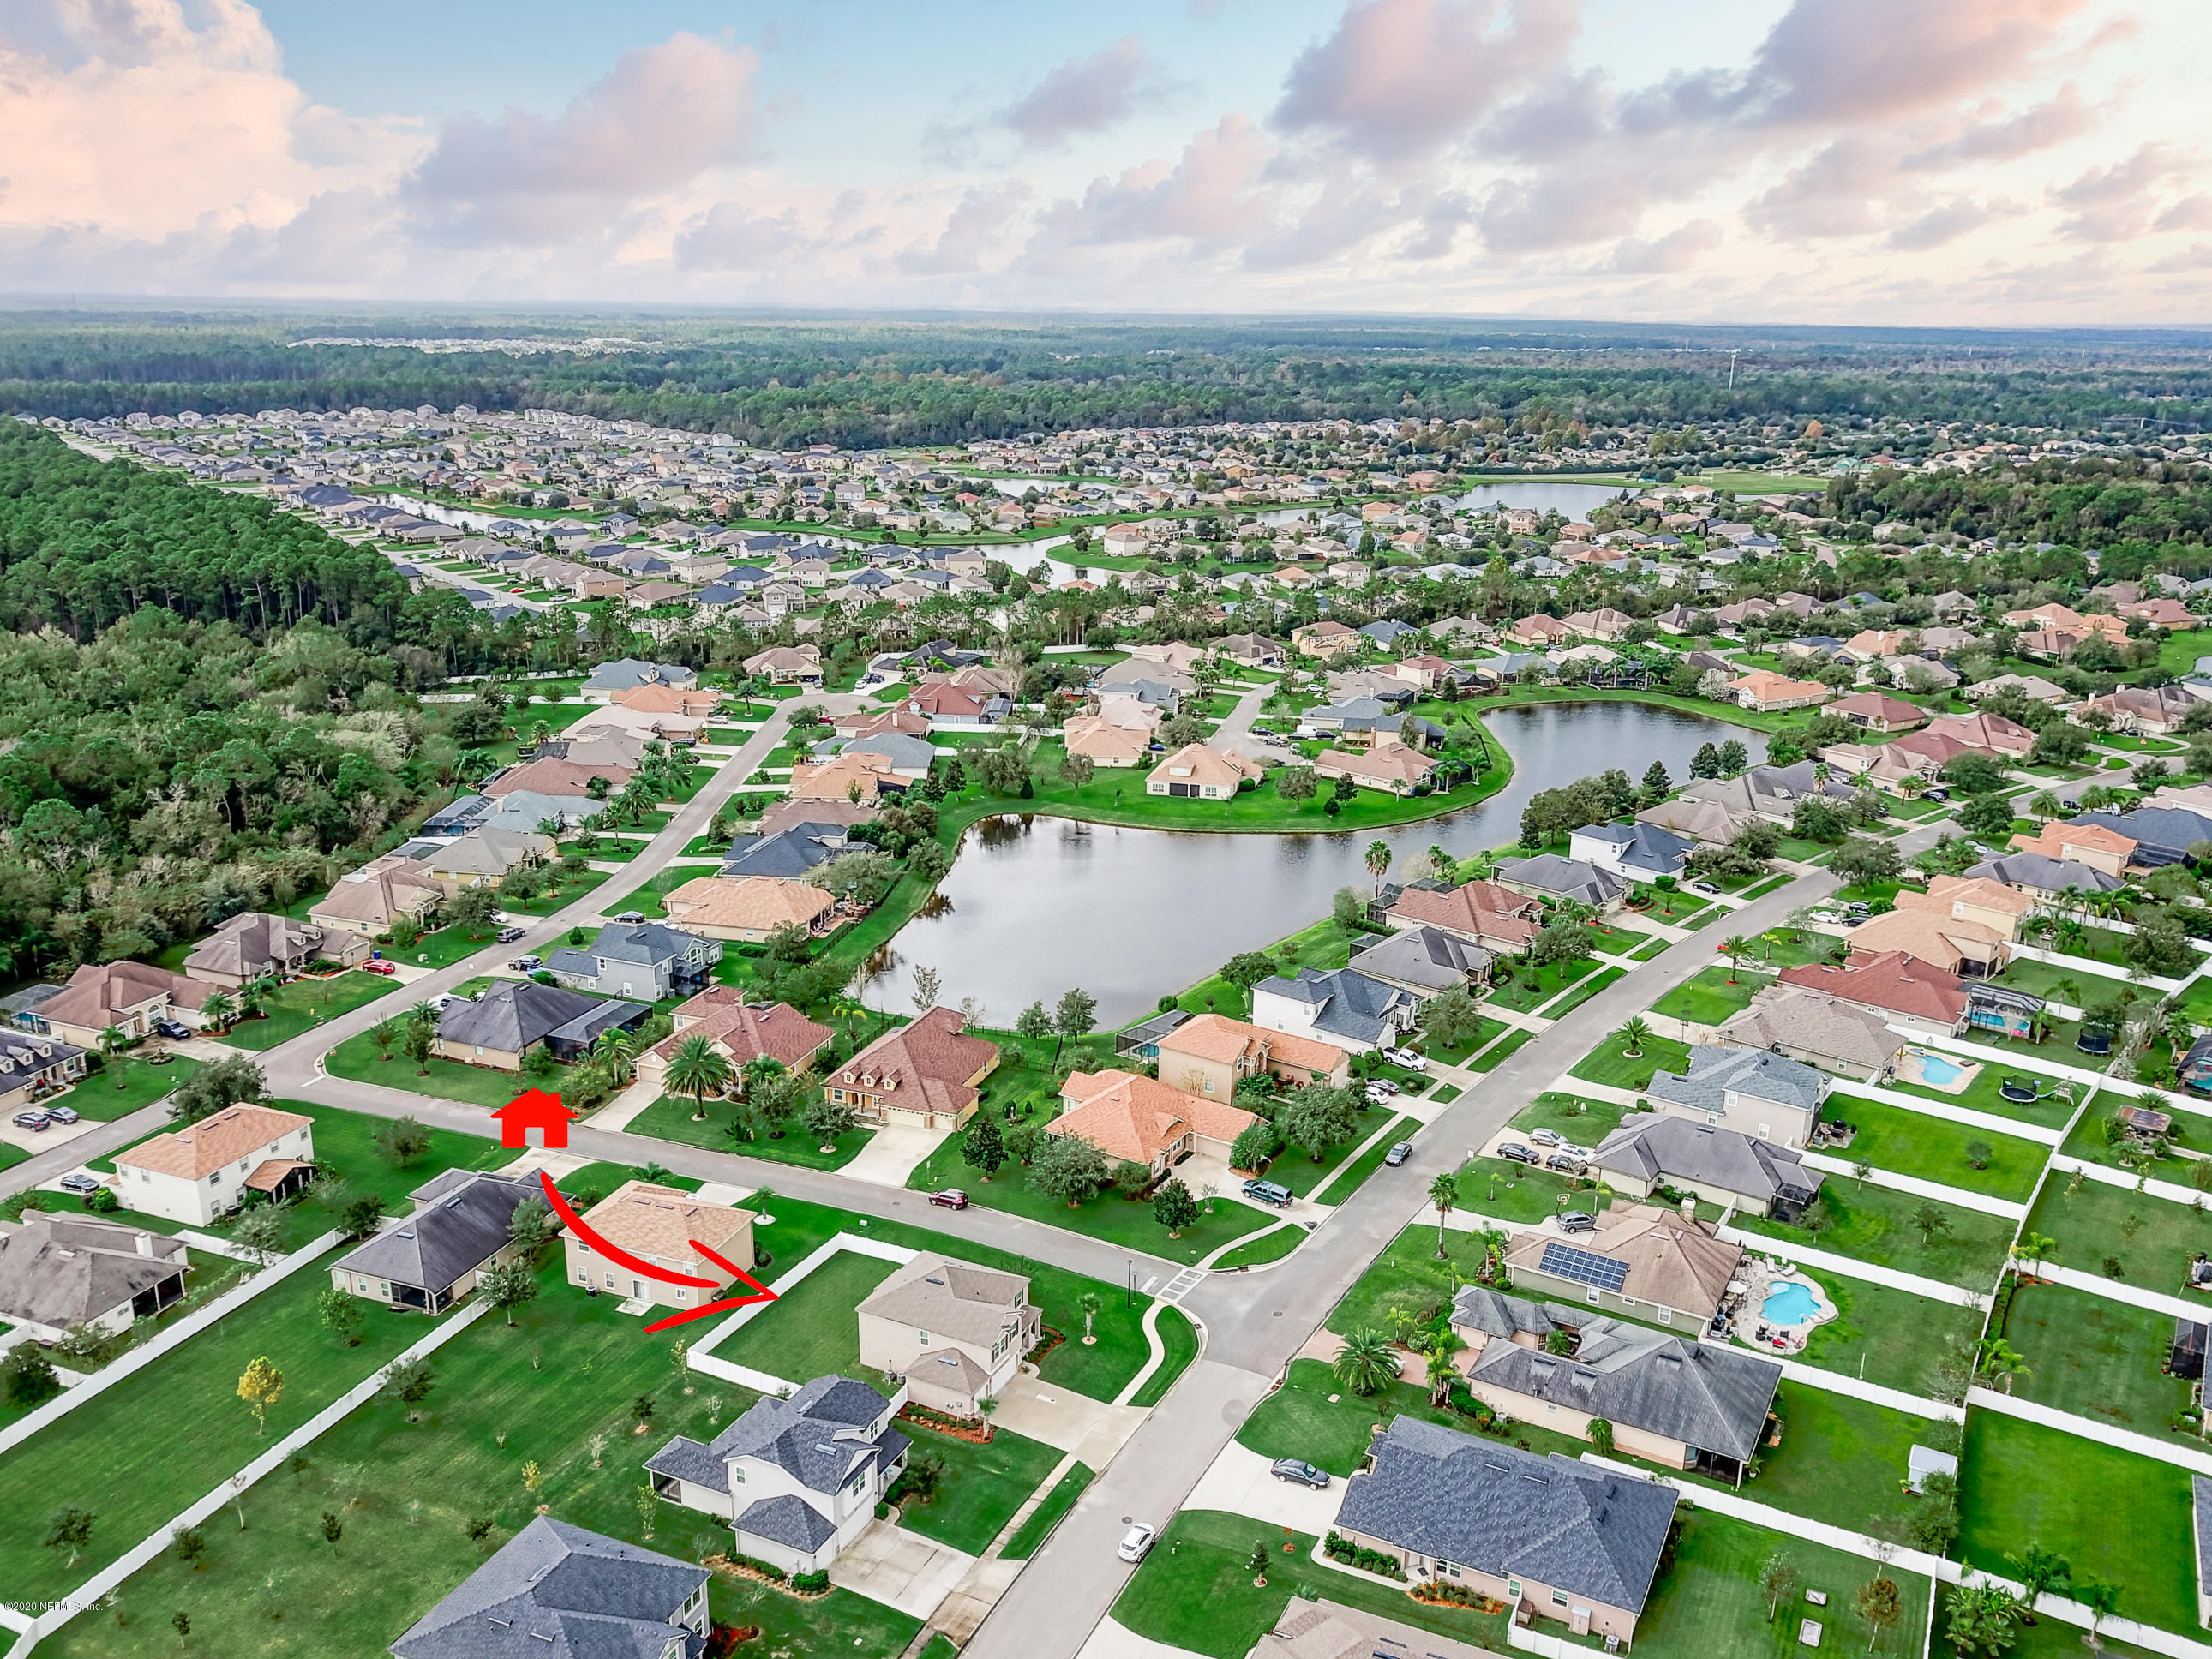 400 PORTA ROSA, ST AUGUSTINE, FLORIDA 32092, 4 Bedrooms Bedrooms, ,4 BathroomsBathrooms,Residential,For sale,PORTA ROSA,1081156